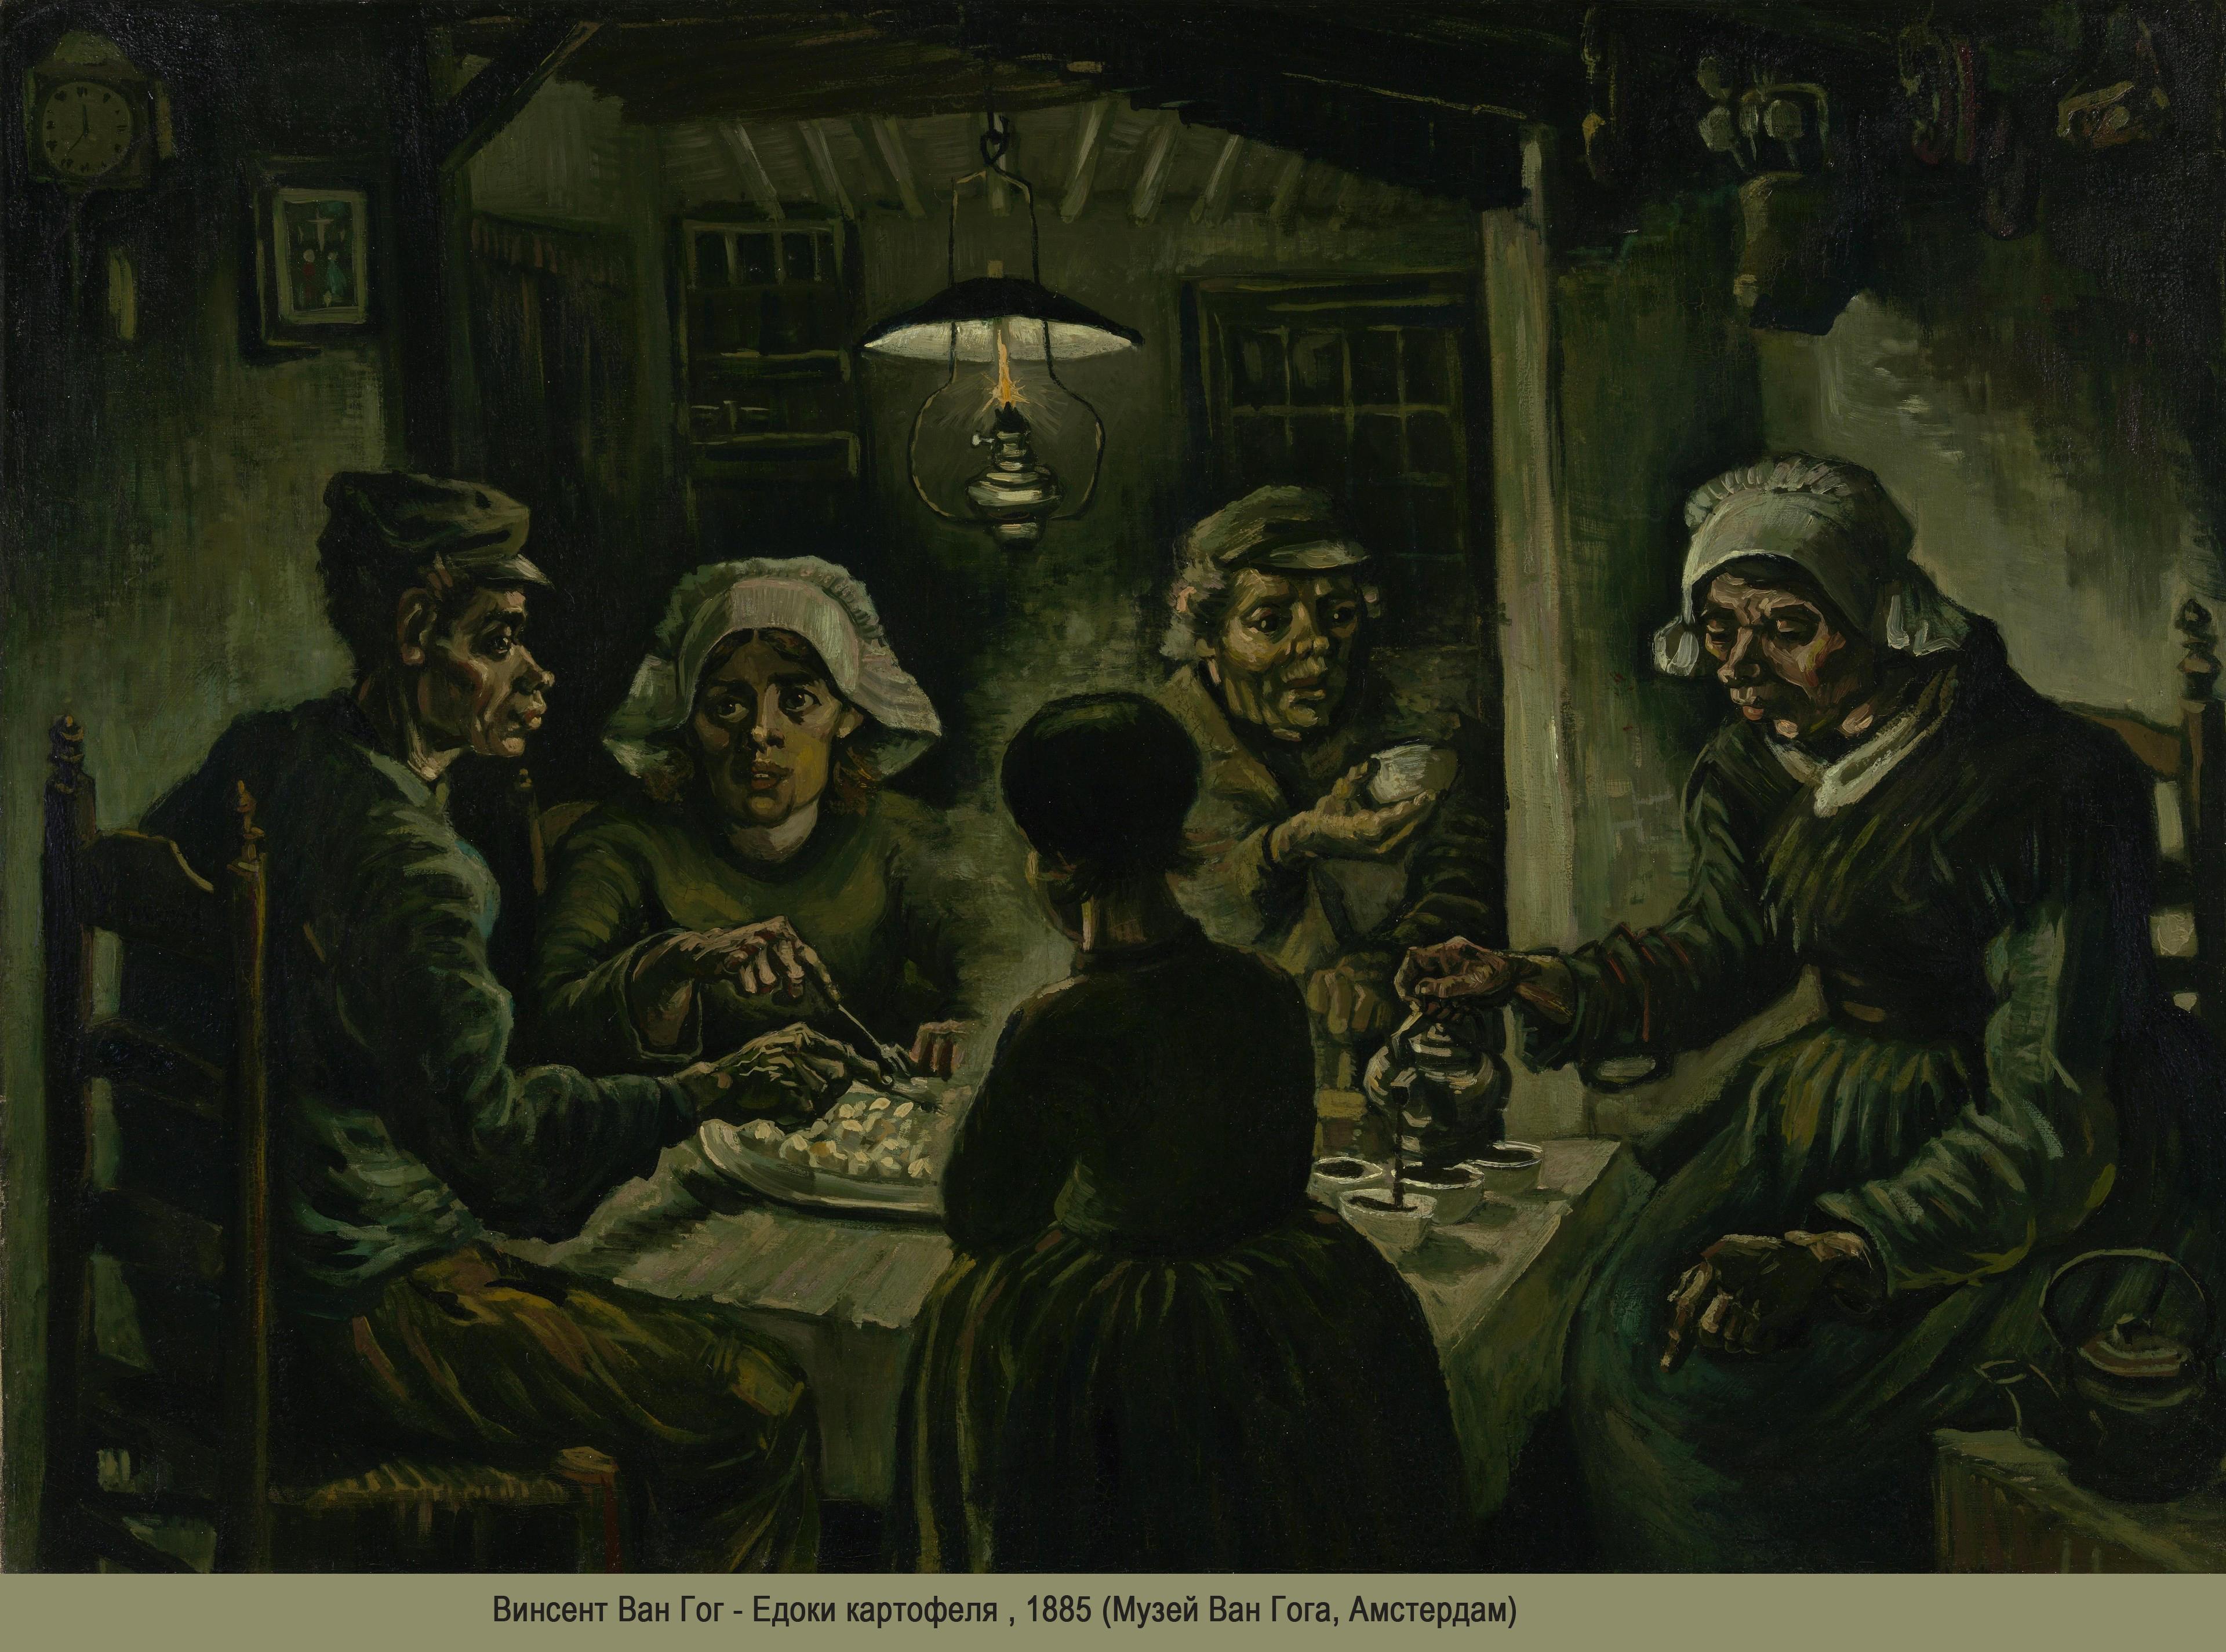 Van Gogh Ван Гог картина едоки картофеля potato eaters пейзажи природы Альберт Сафиуллин